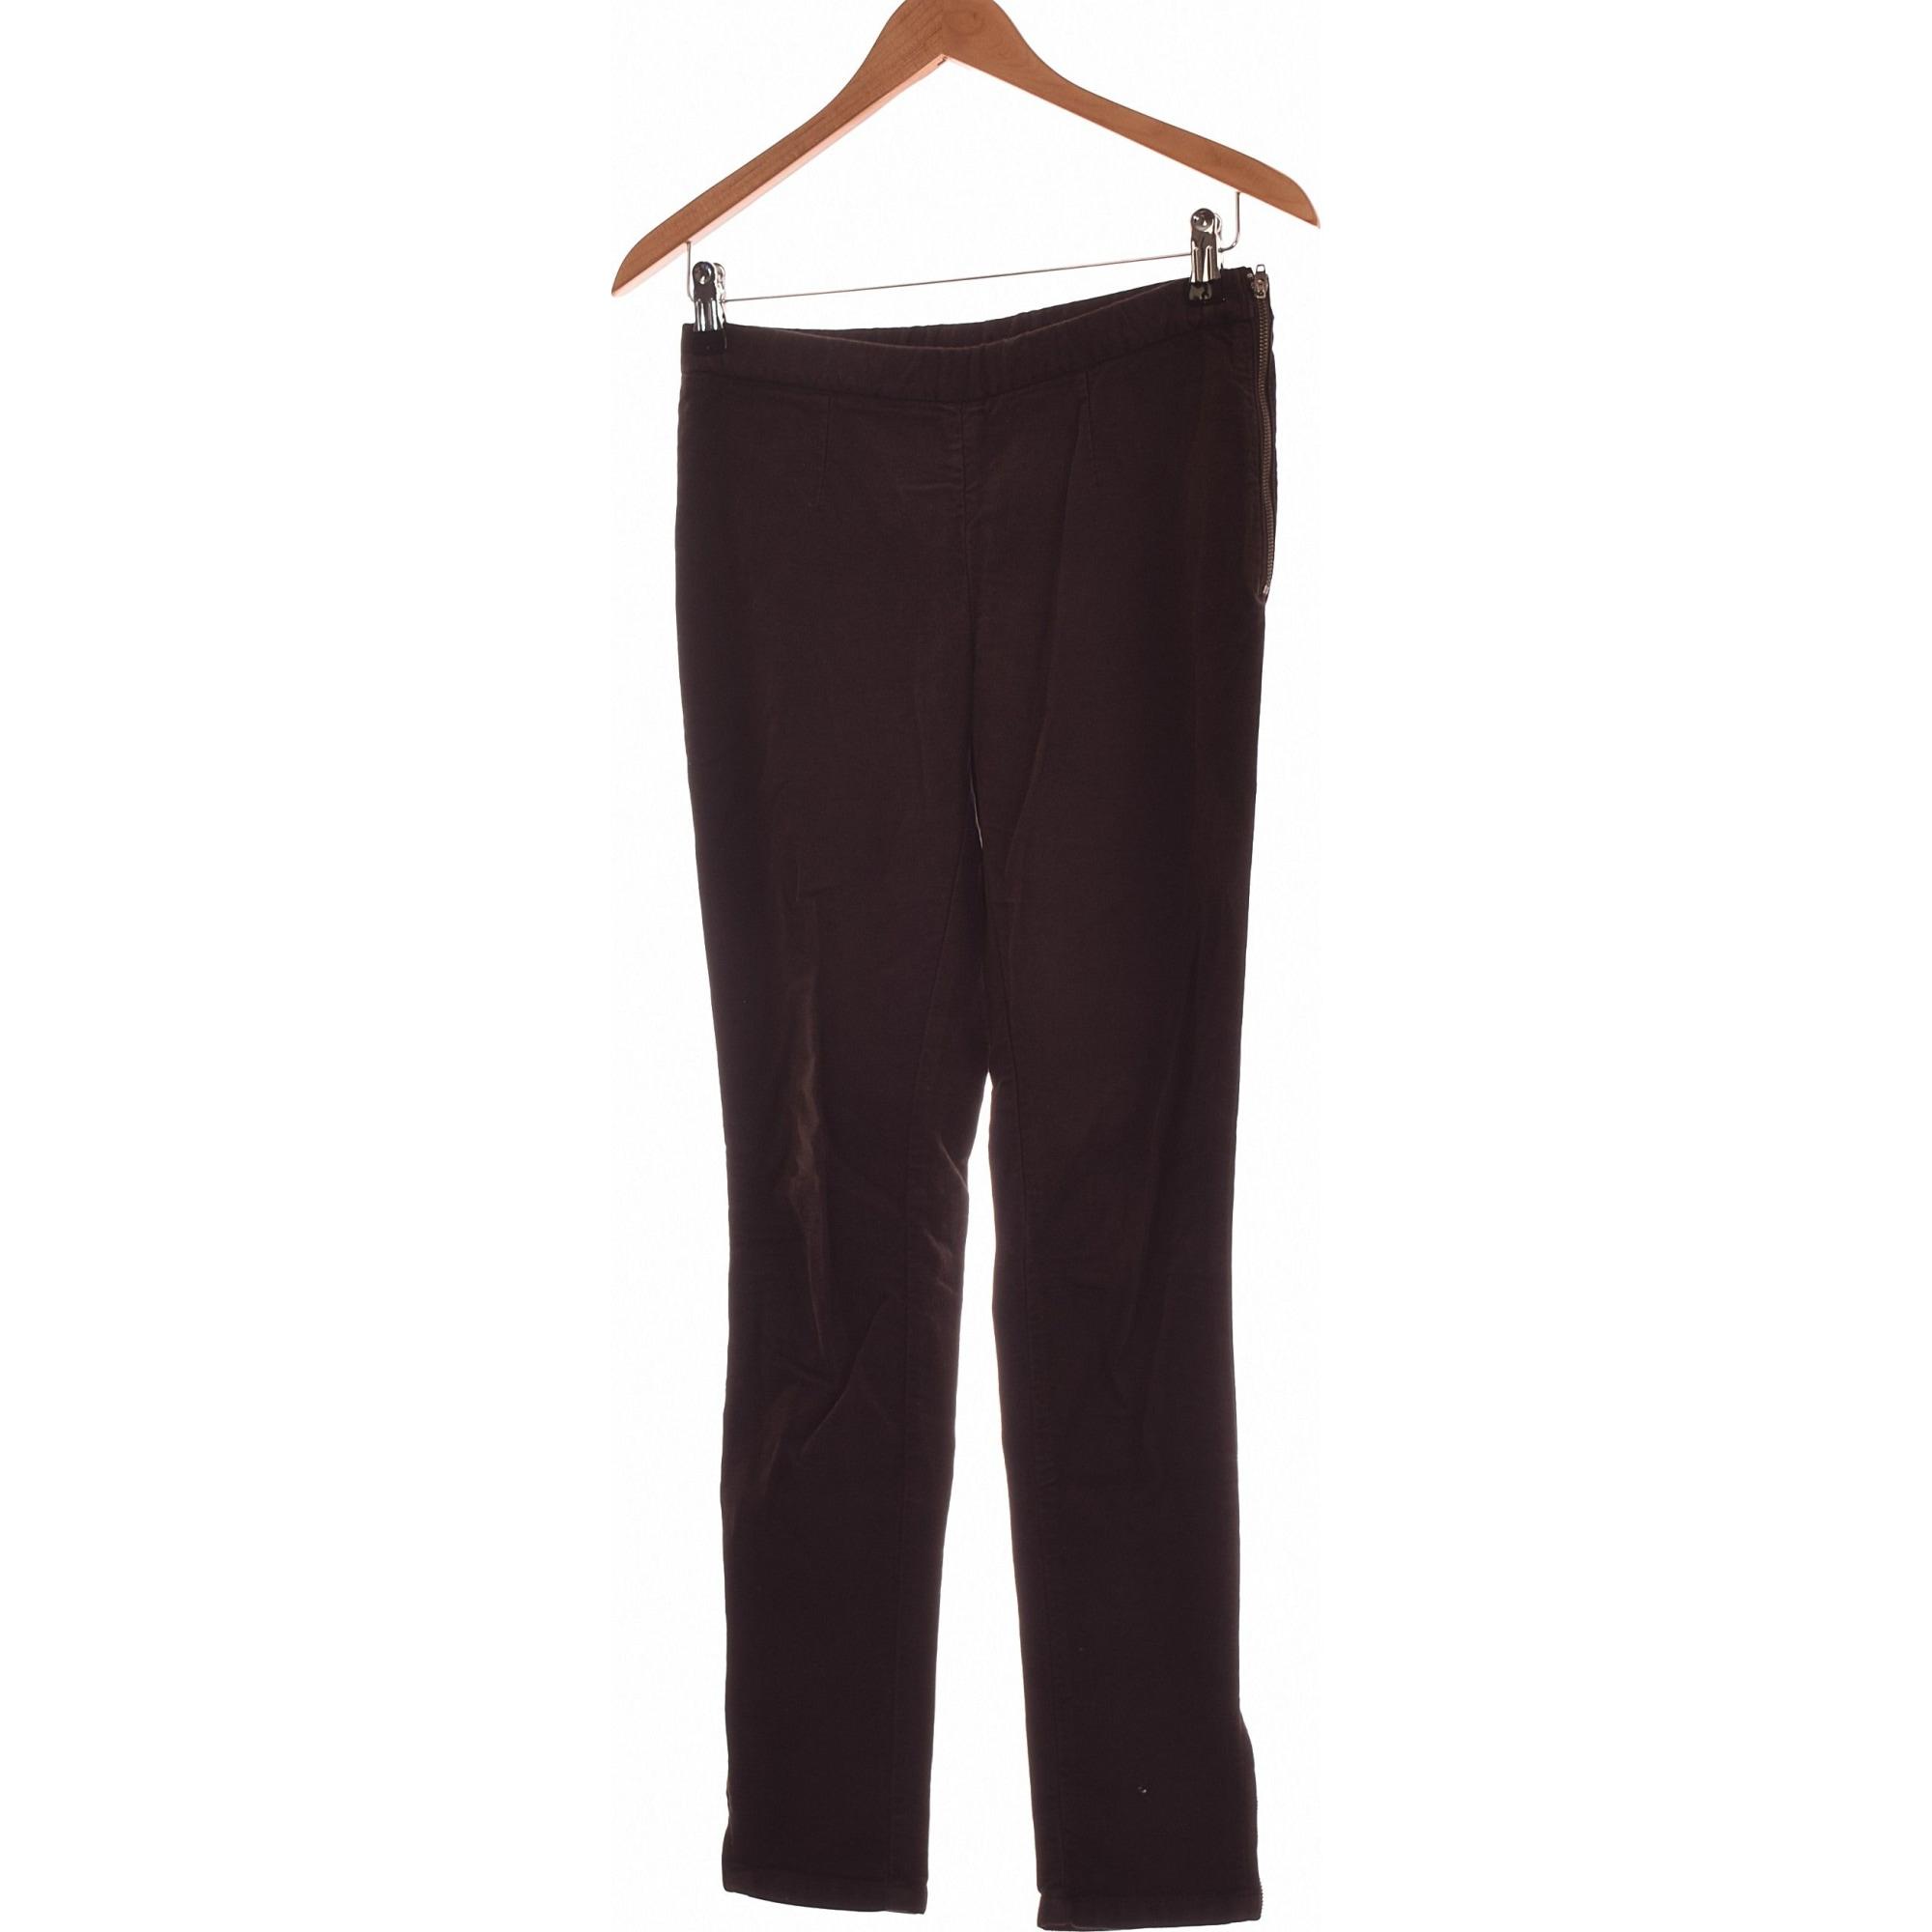 Pantalon slim, cigarette AMERICAN VINTAGE Noir